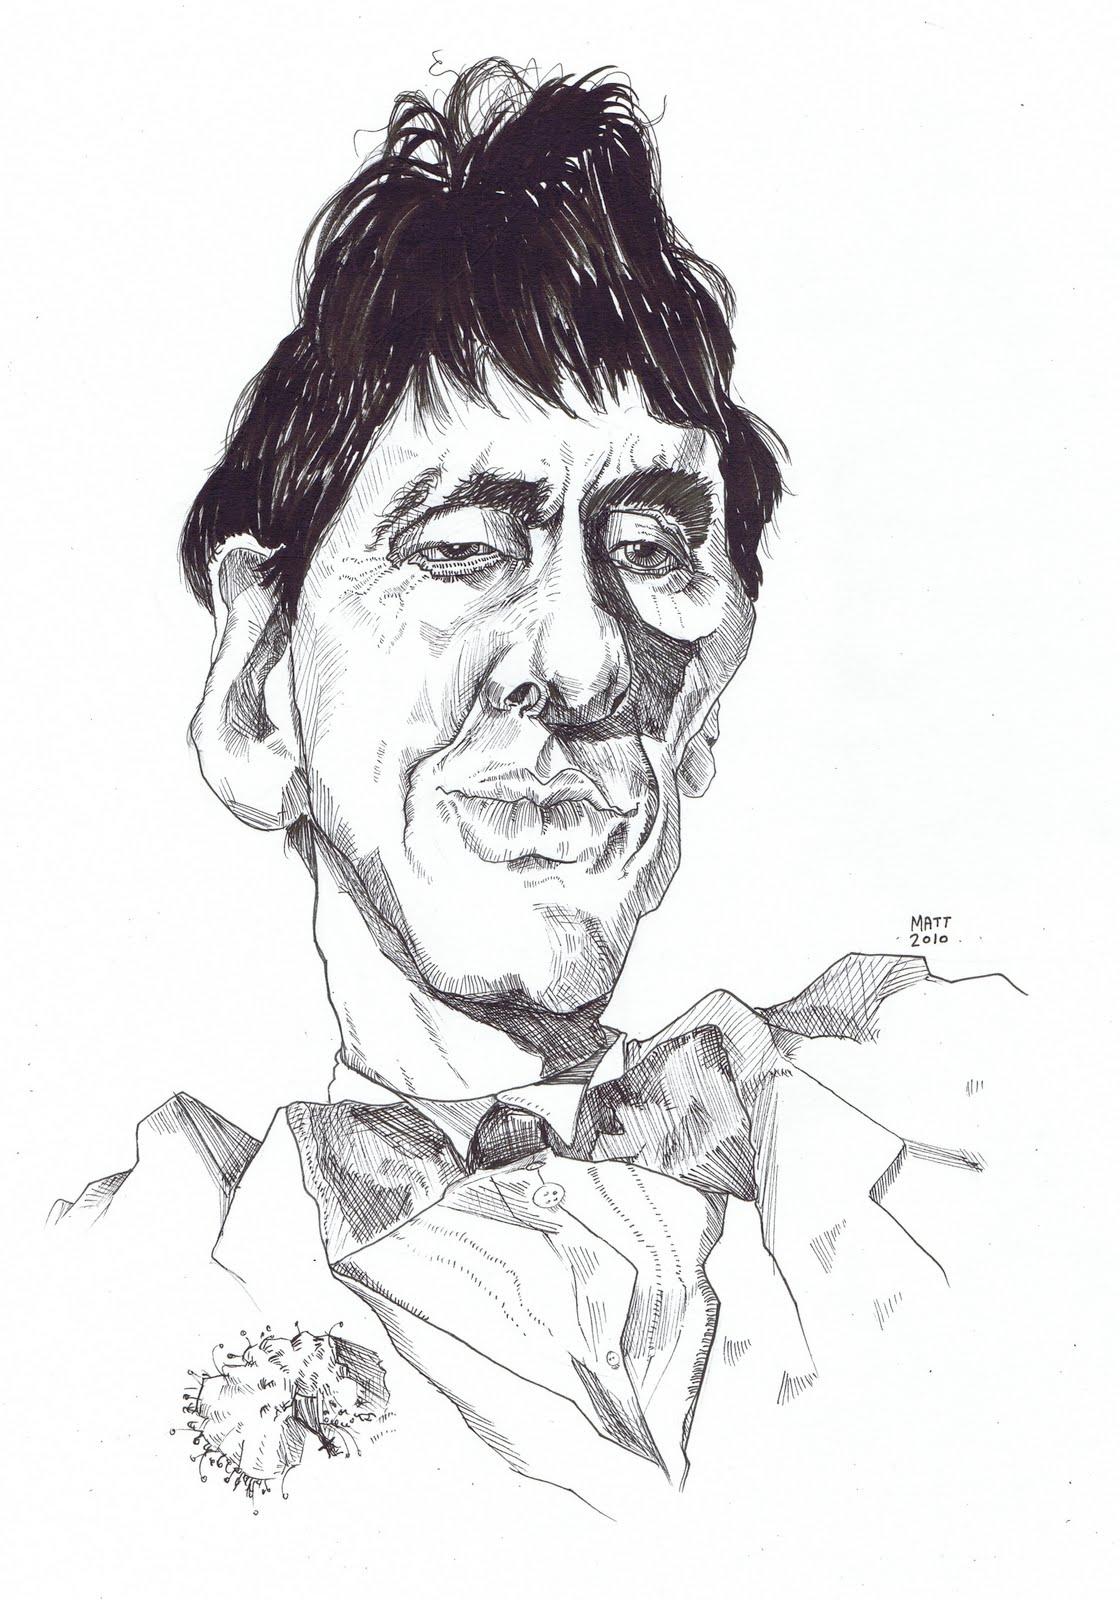 http://4.bp.blogspot.com/_seCueTBCTzs/THKvuUqWFzI/AAAAAAAABow/phBRqOmtT7c/s1600/Al+Pacino.jpg